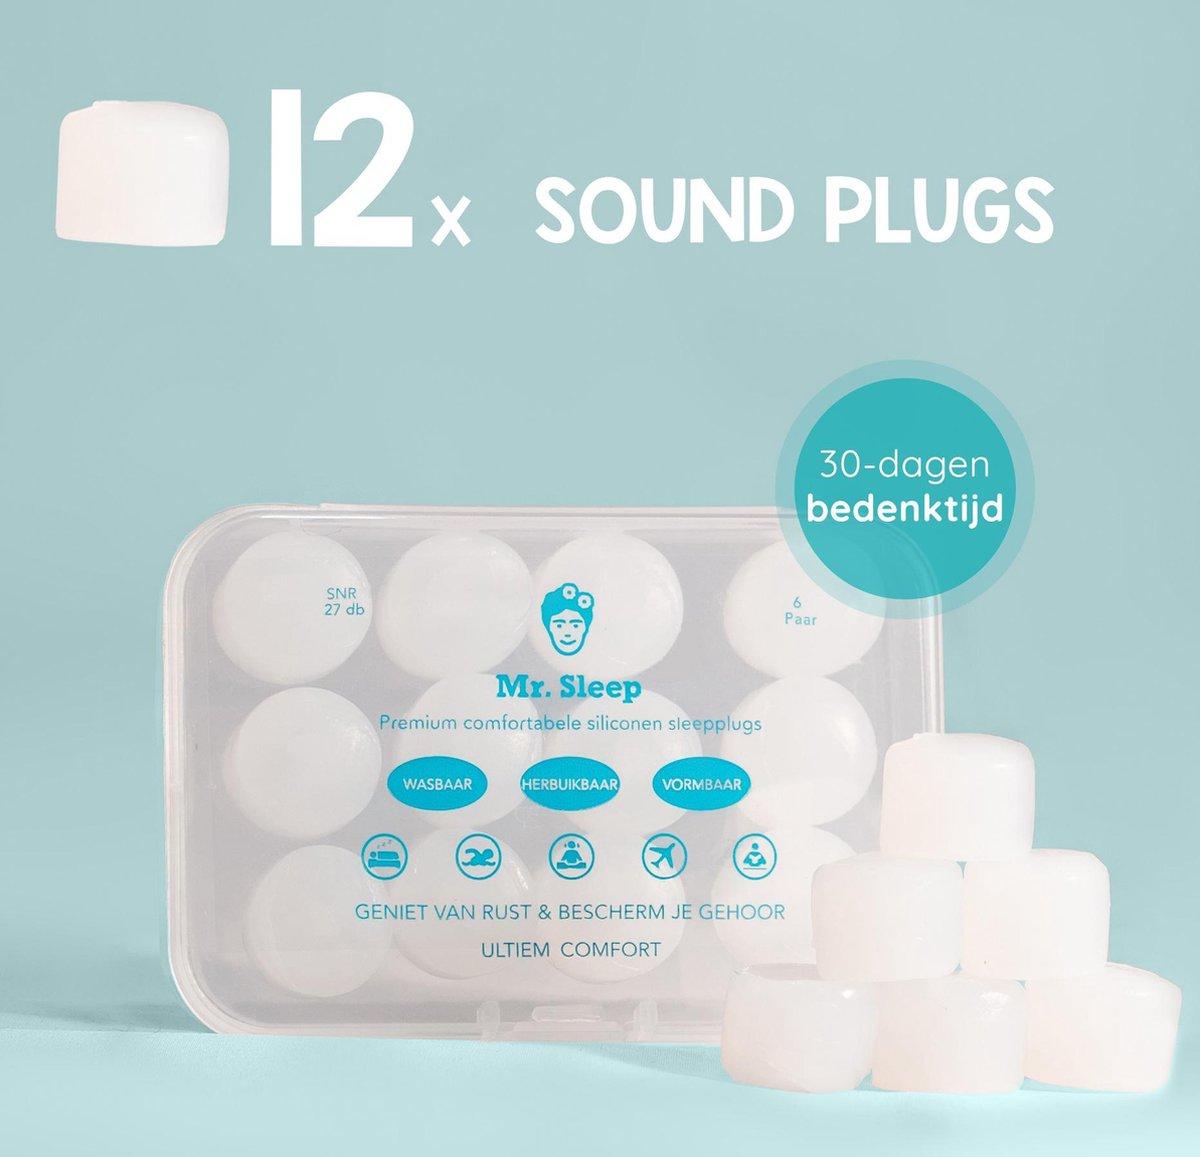 Mr Sleep® - 12x Sound plugs - Oordoppen - Earplugs - Geluidsoverlast - Slapen - Zwem Oordopjes - Sla